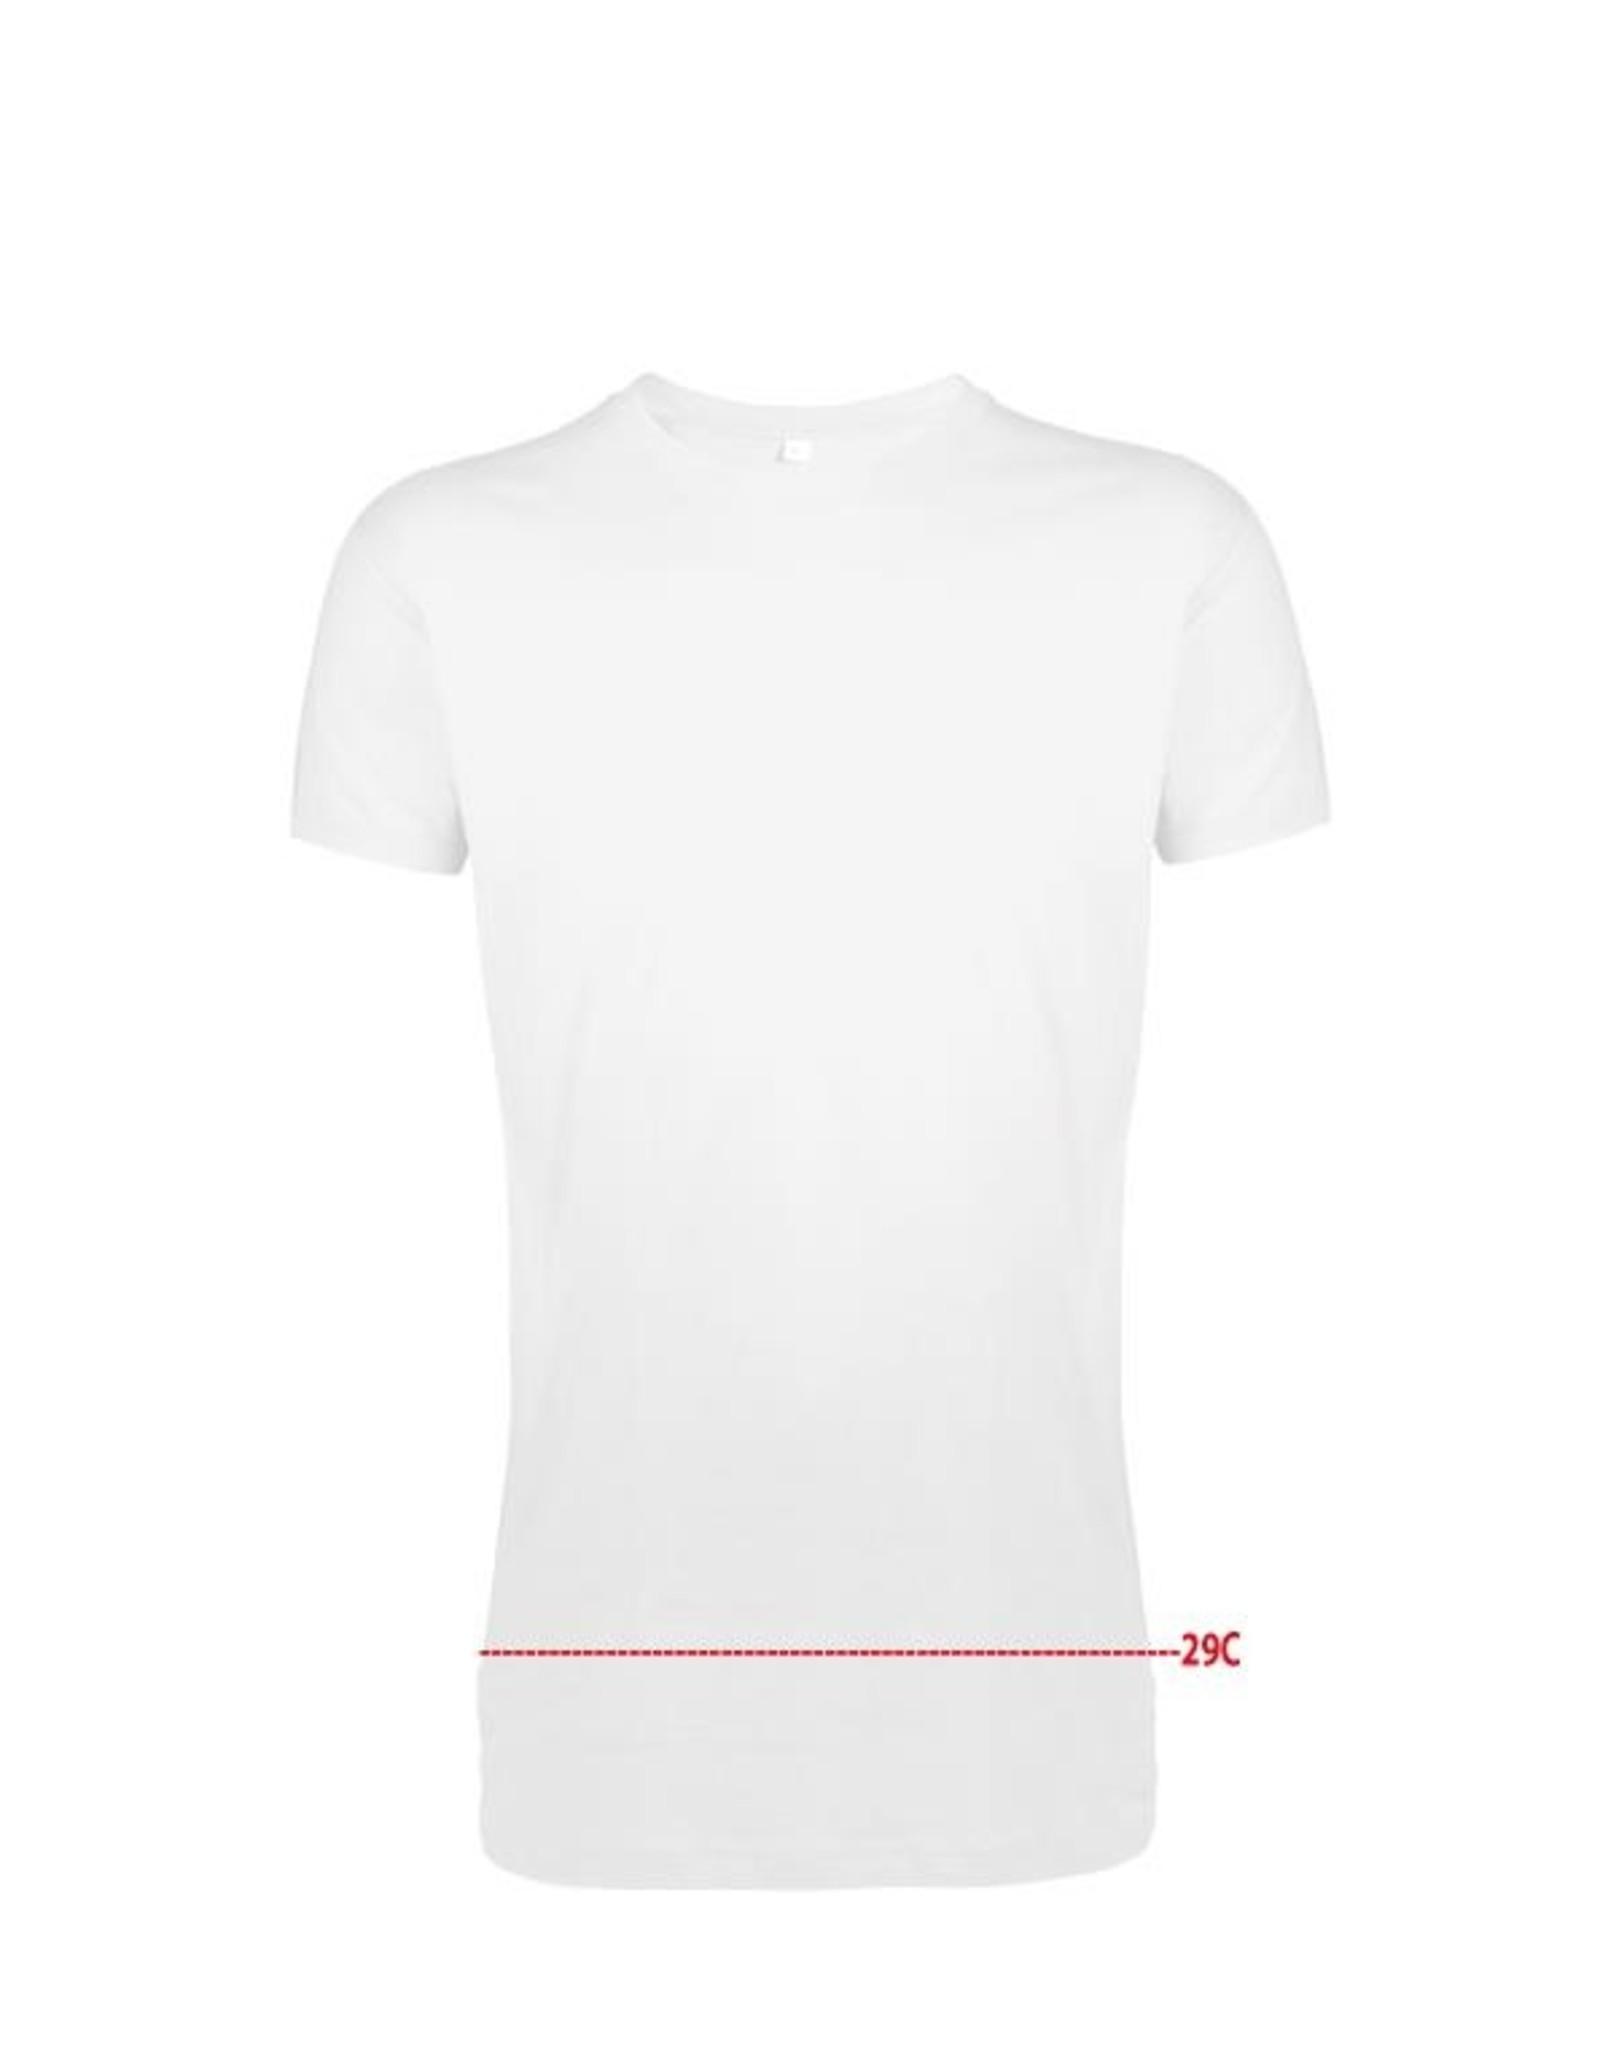 Logostar T-SHIRT basic extra lang wit